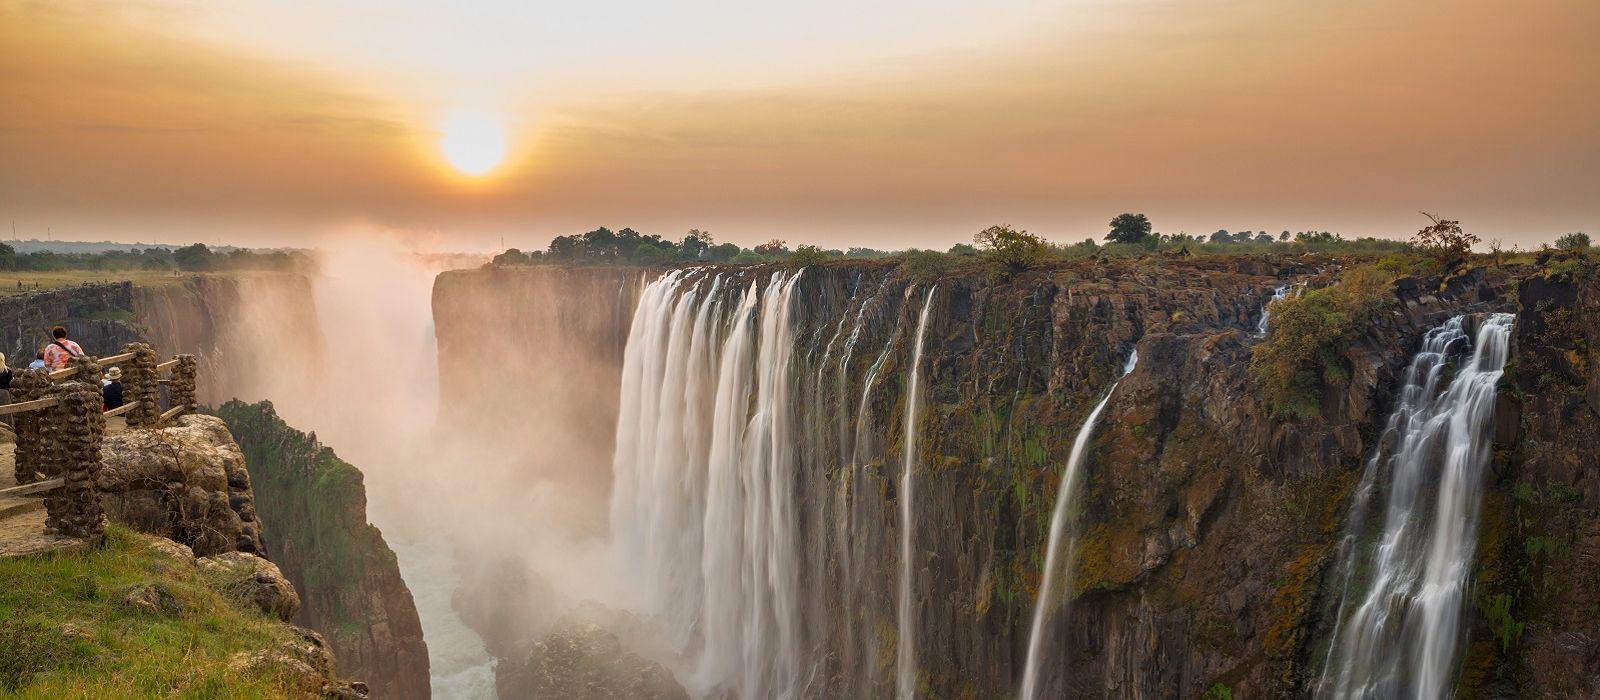 Selbstfahrer-Reise nach Südafrika, Namibia & Simbabwe: Nord Kap via Caprivi und Viktoriafälle Urlaub 7